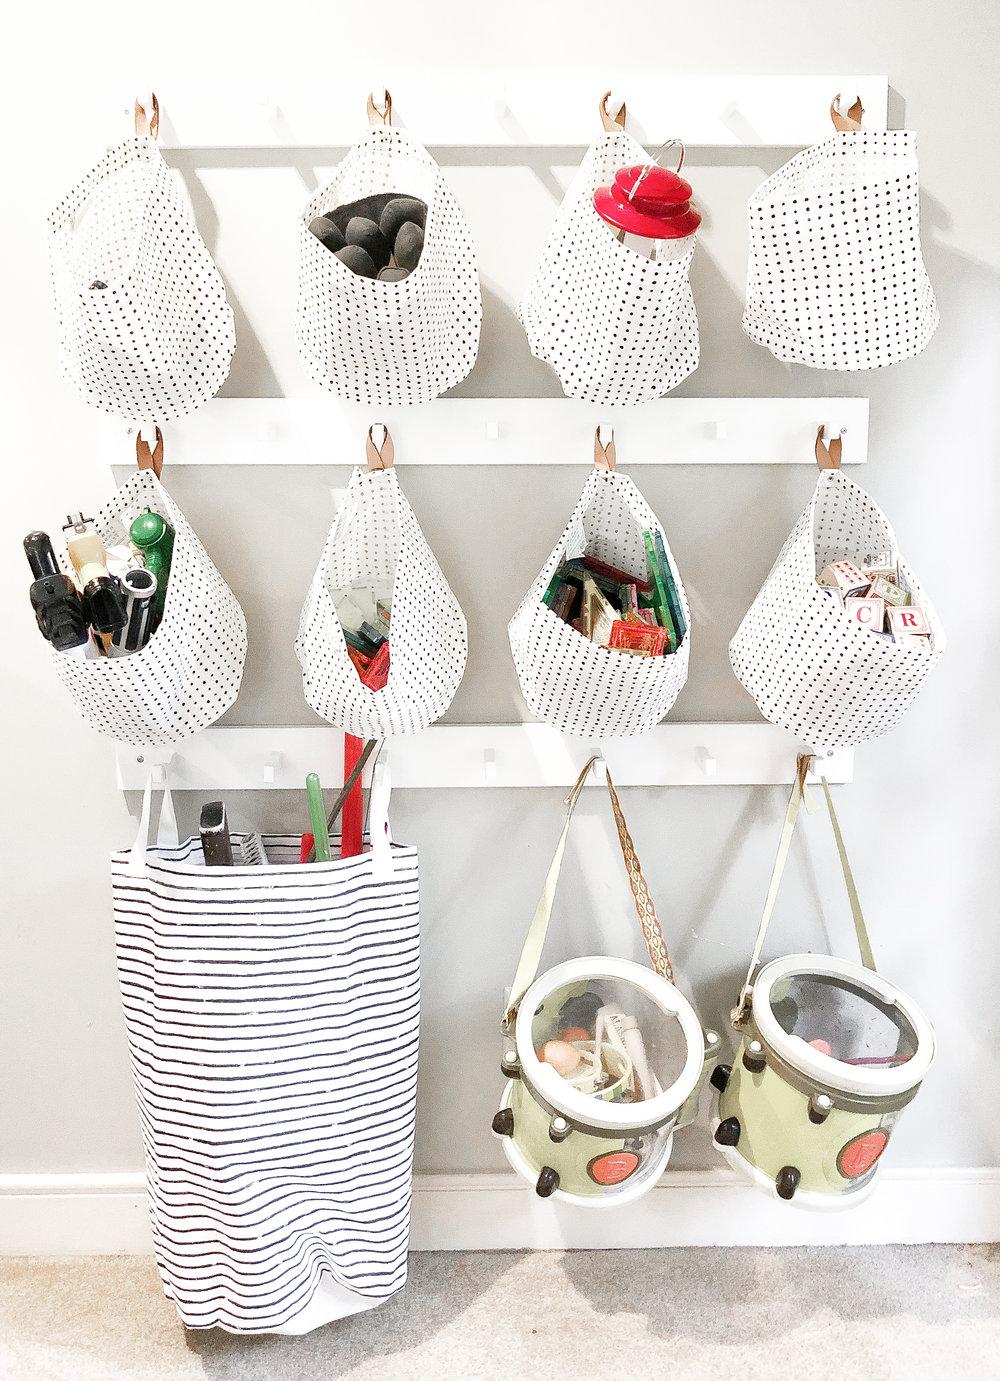 Ikea Kubbis hooks    with    Klunka laundry bag    or    Plumsa storage bags